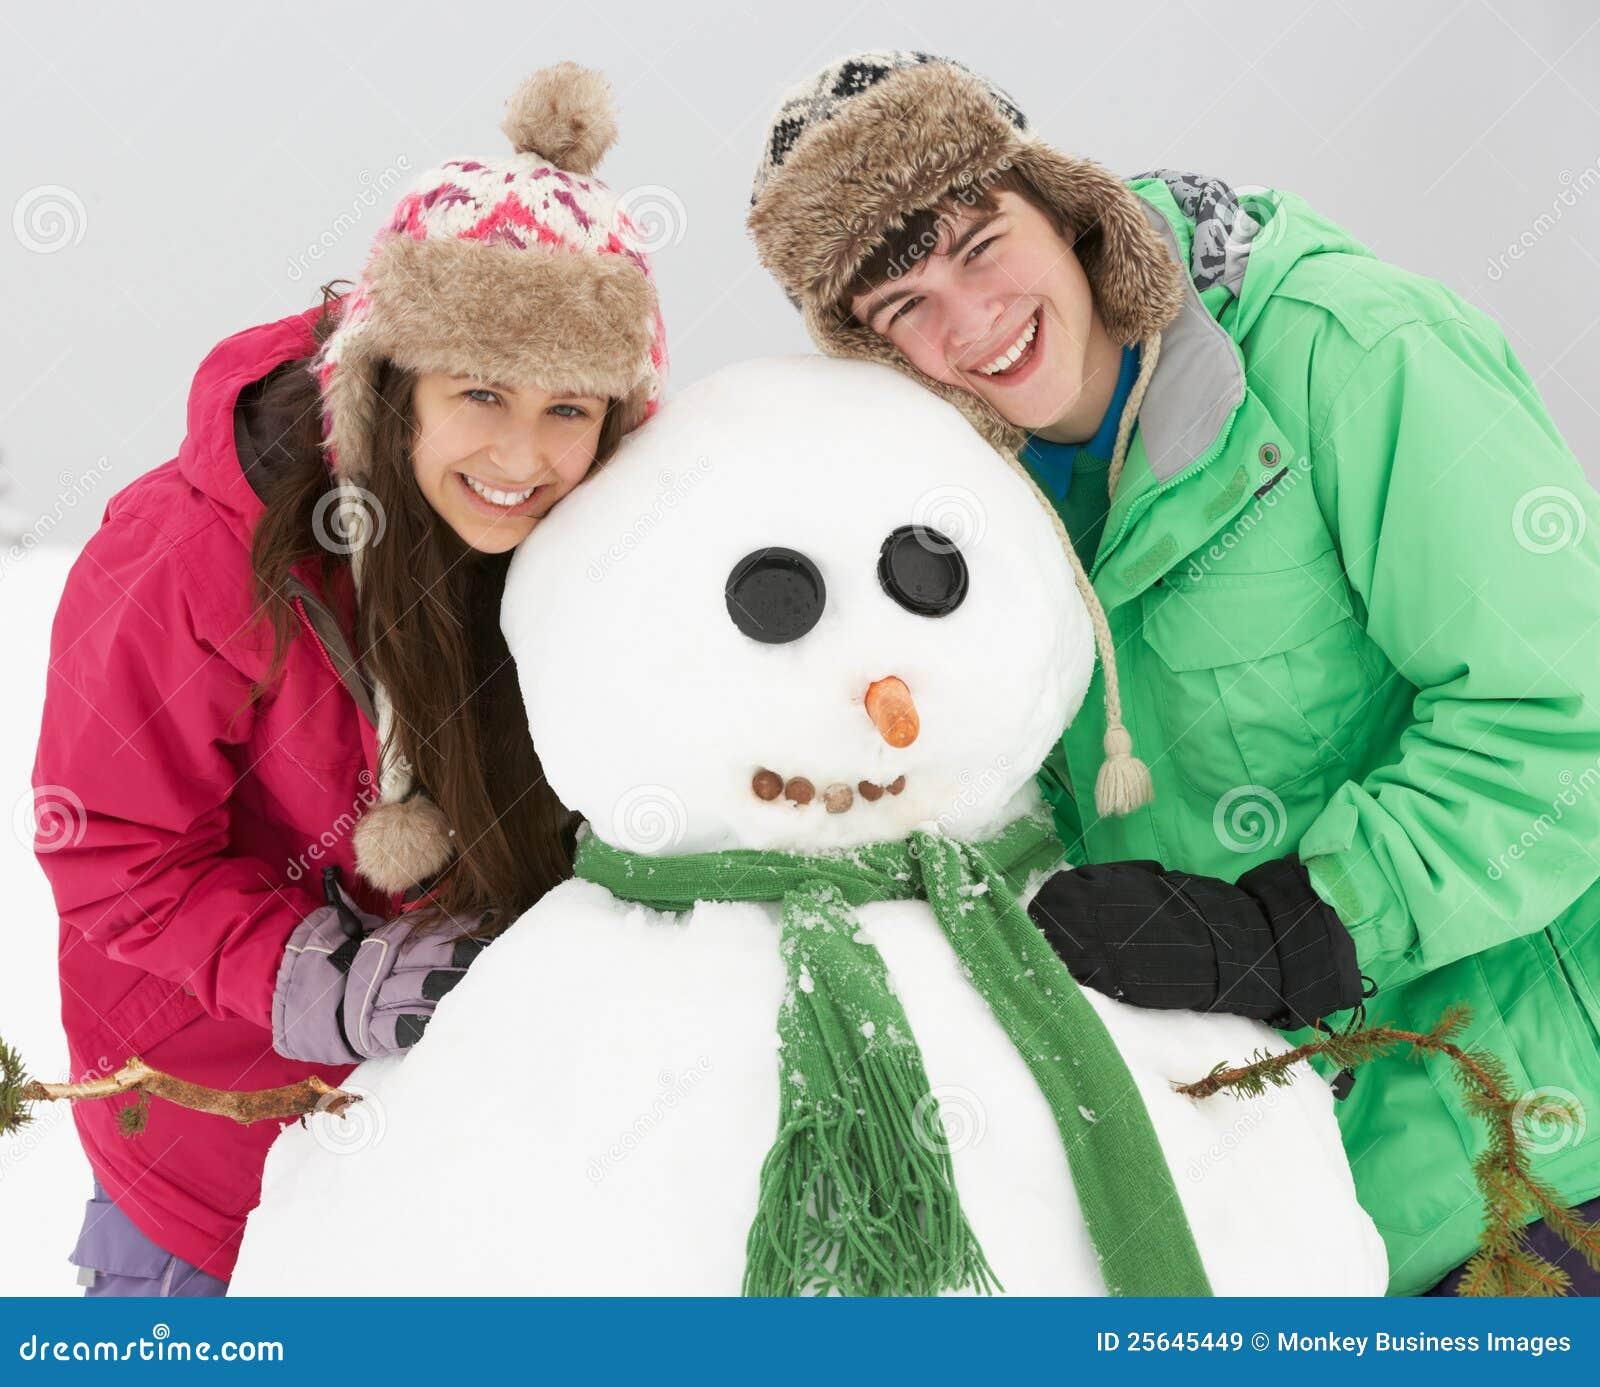 Adolescents adolescents tube neige plus